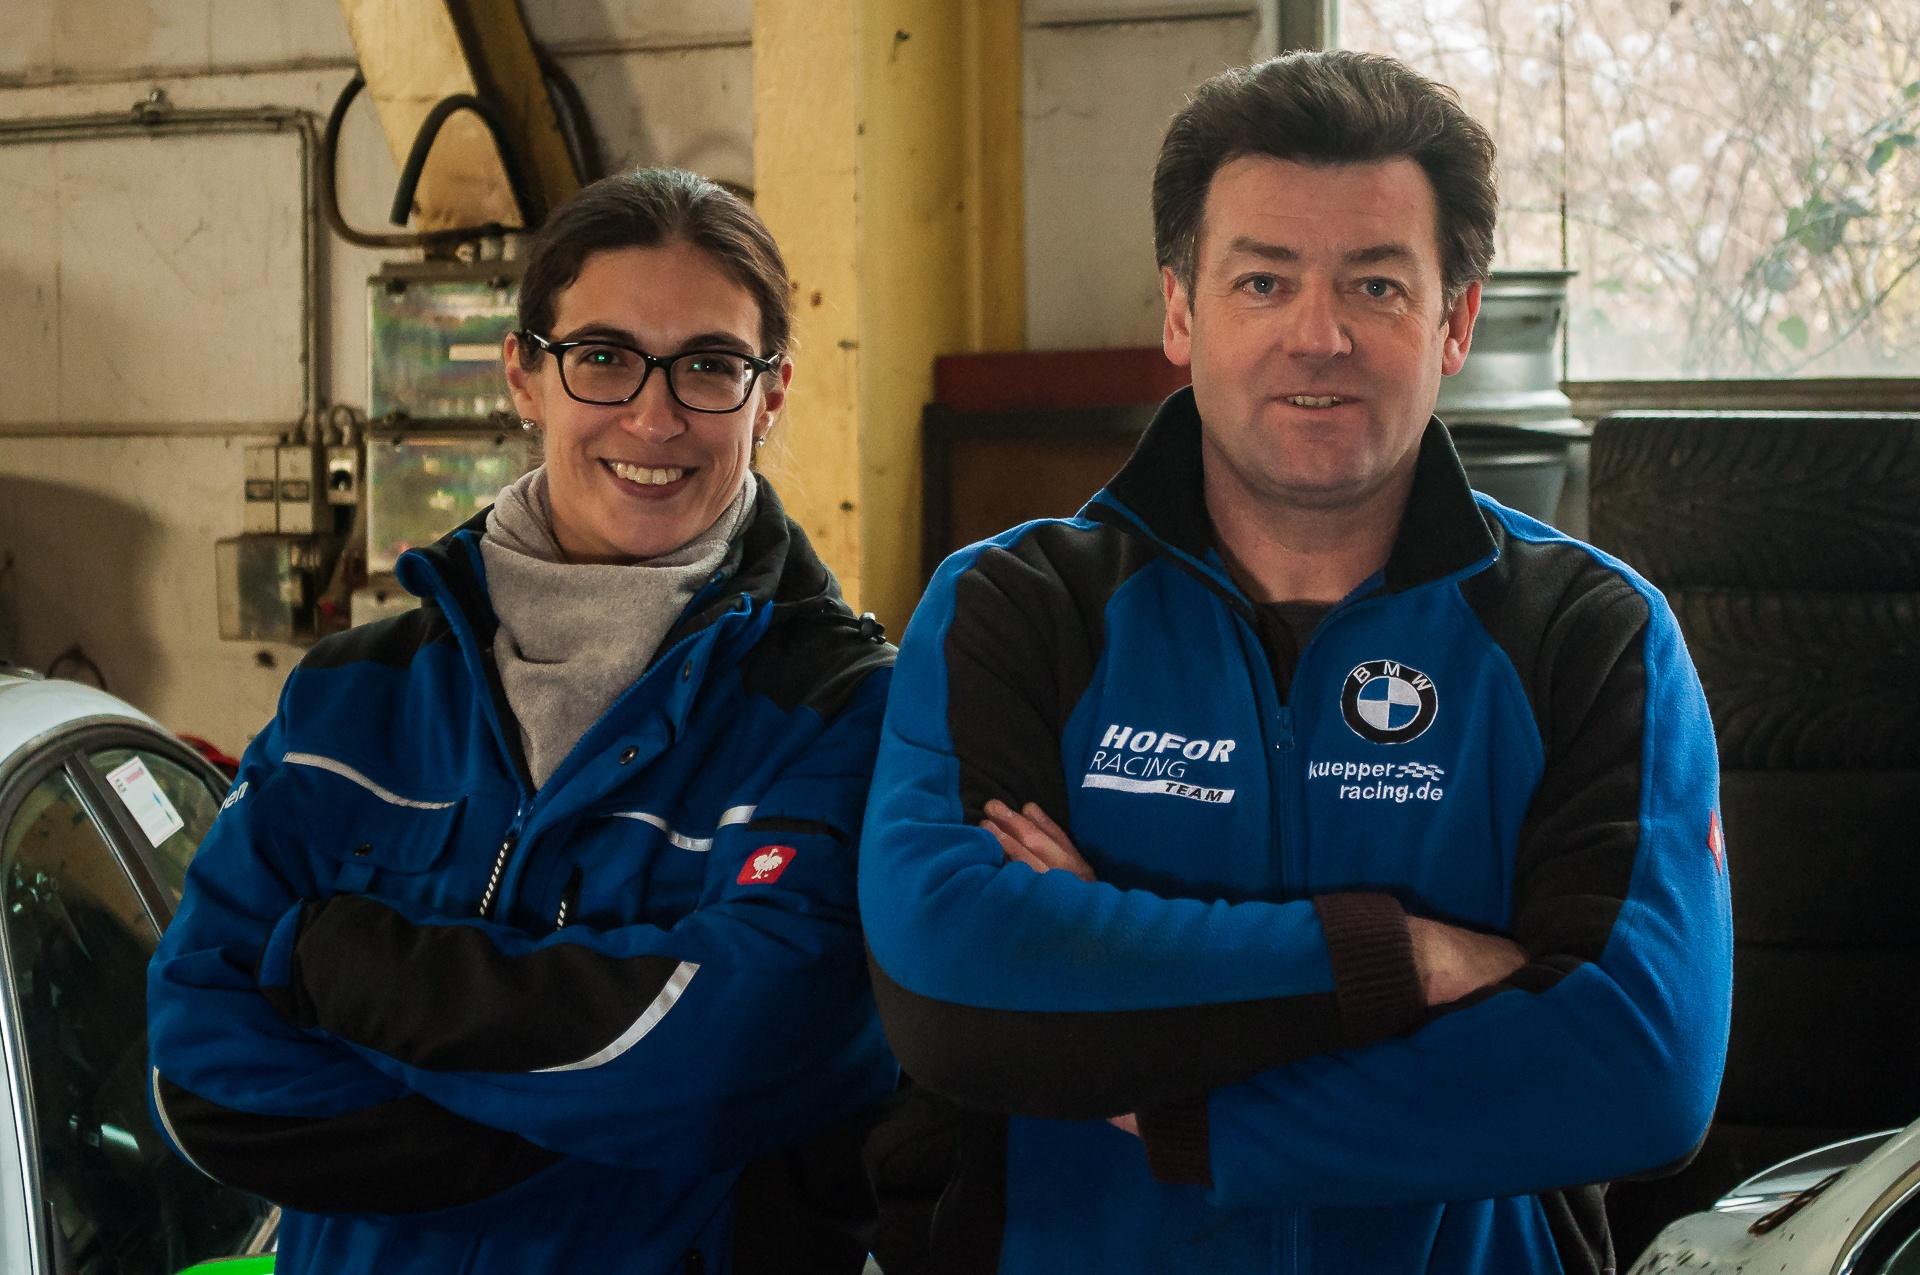 Carmen Groß und Bernd Küpper